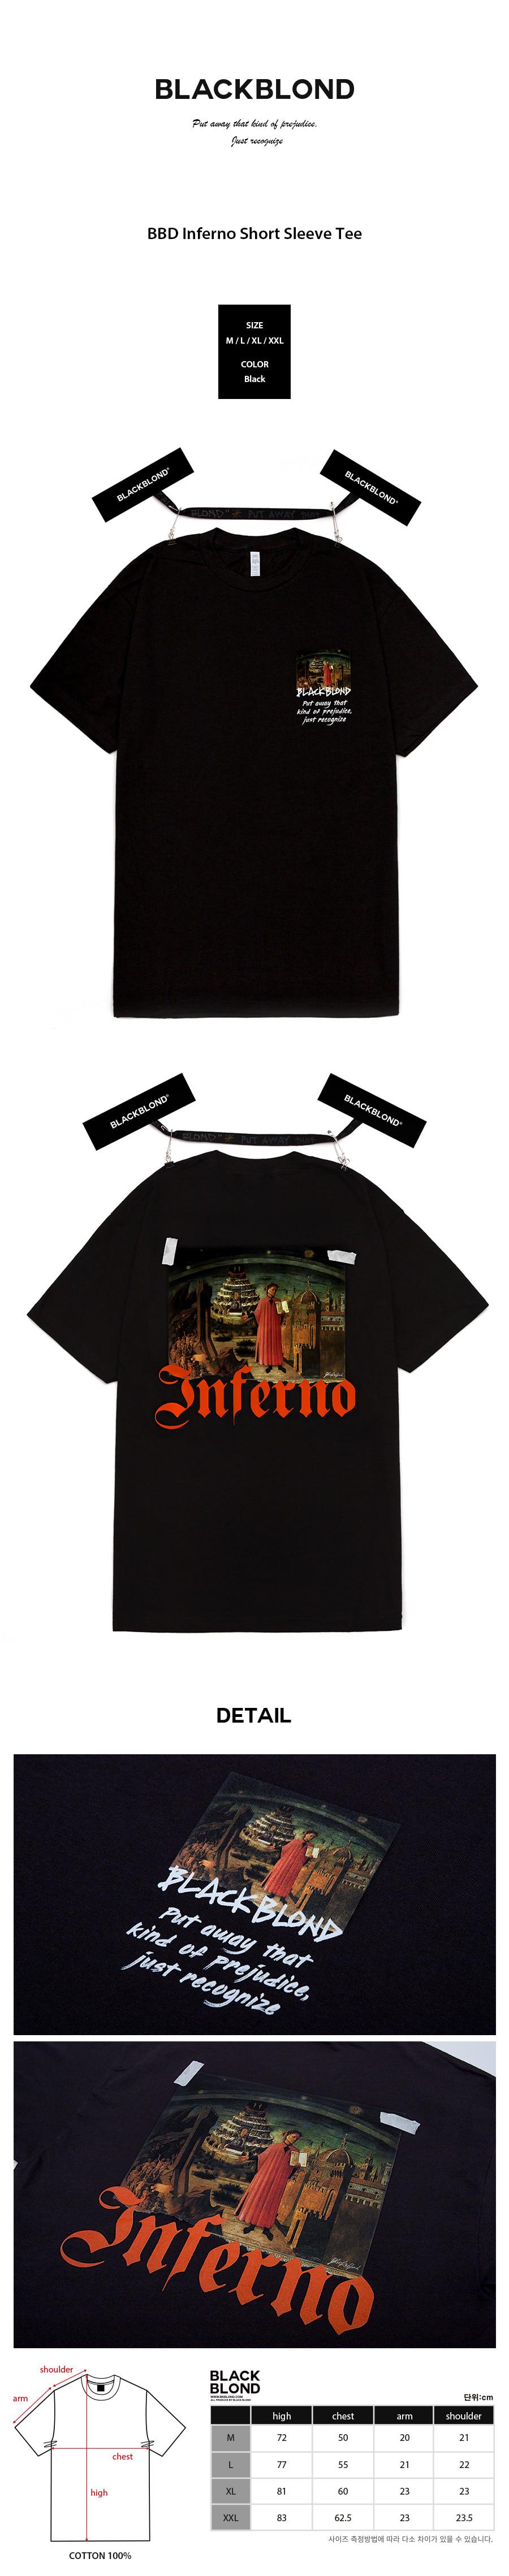 BBD-Inferno-Short-Sleeve-Tee-%28Black%29.jpg